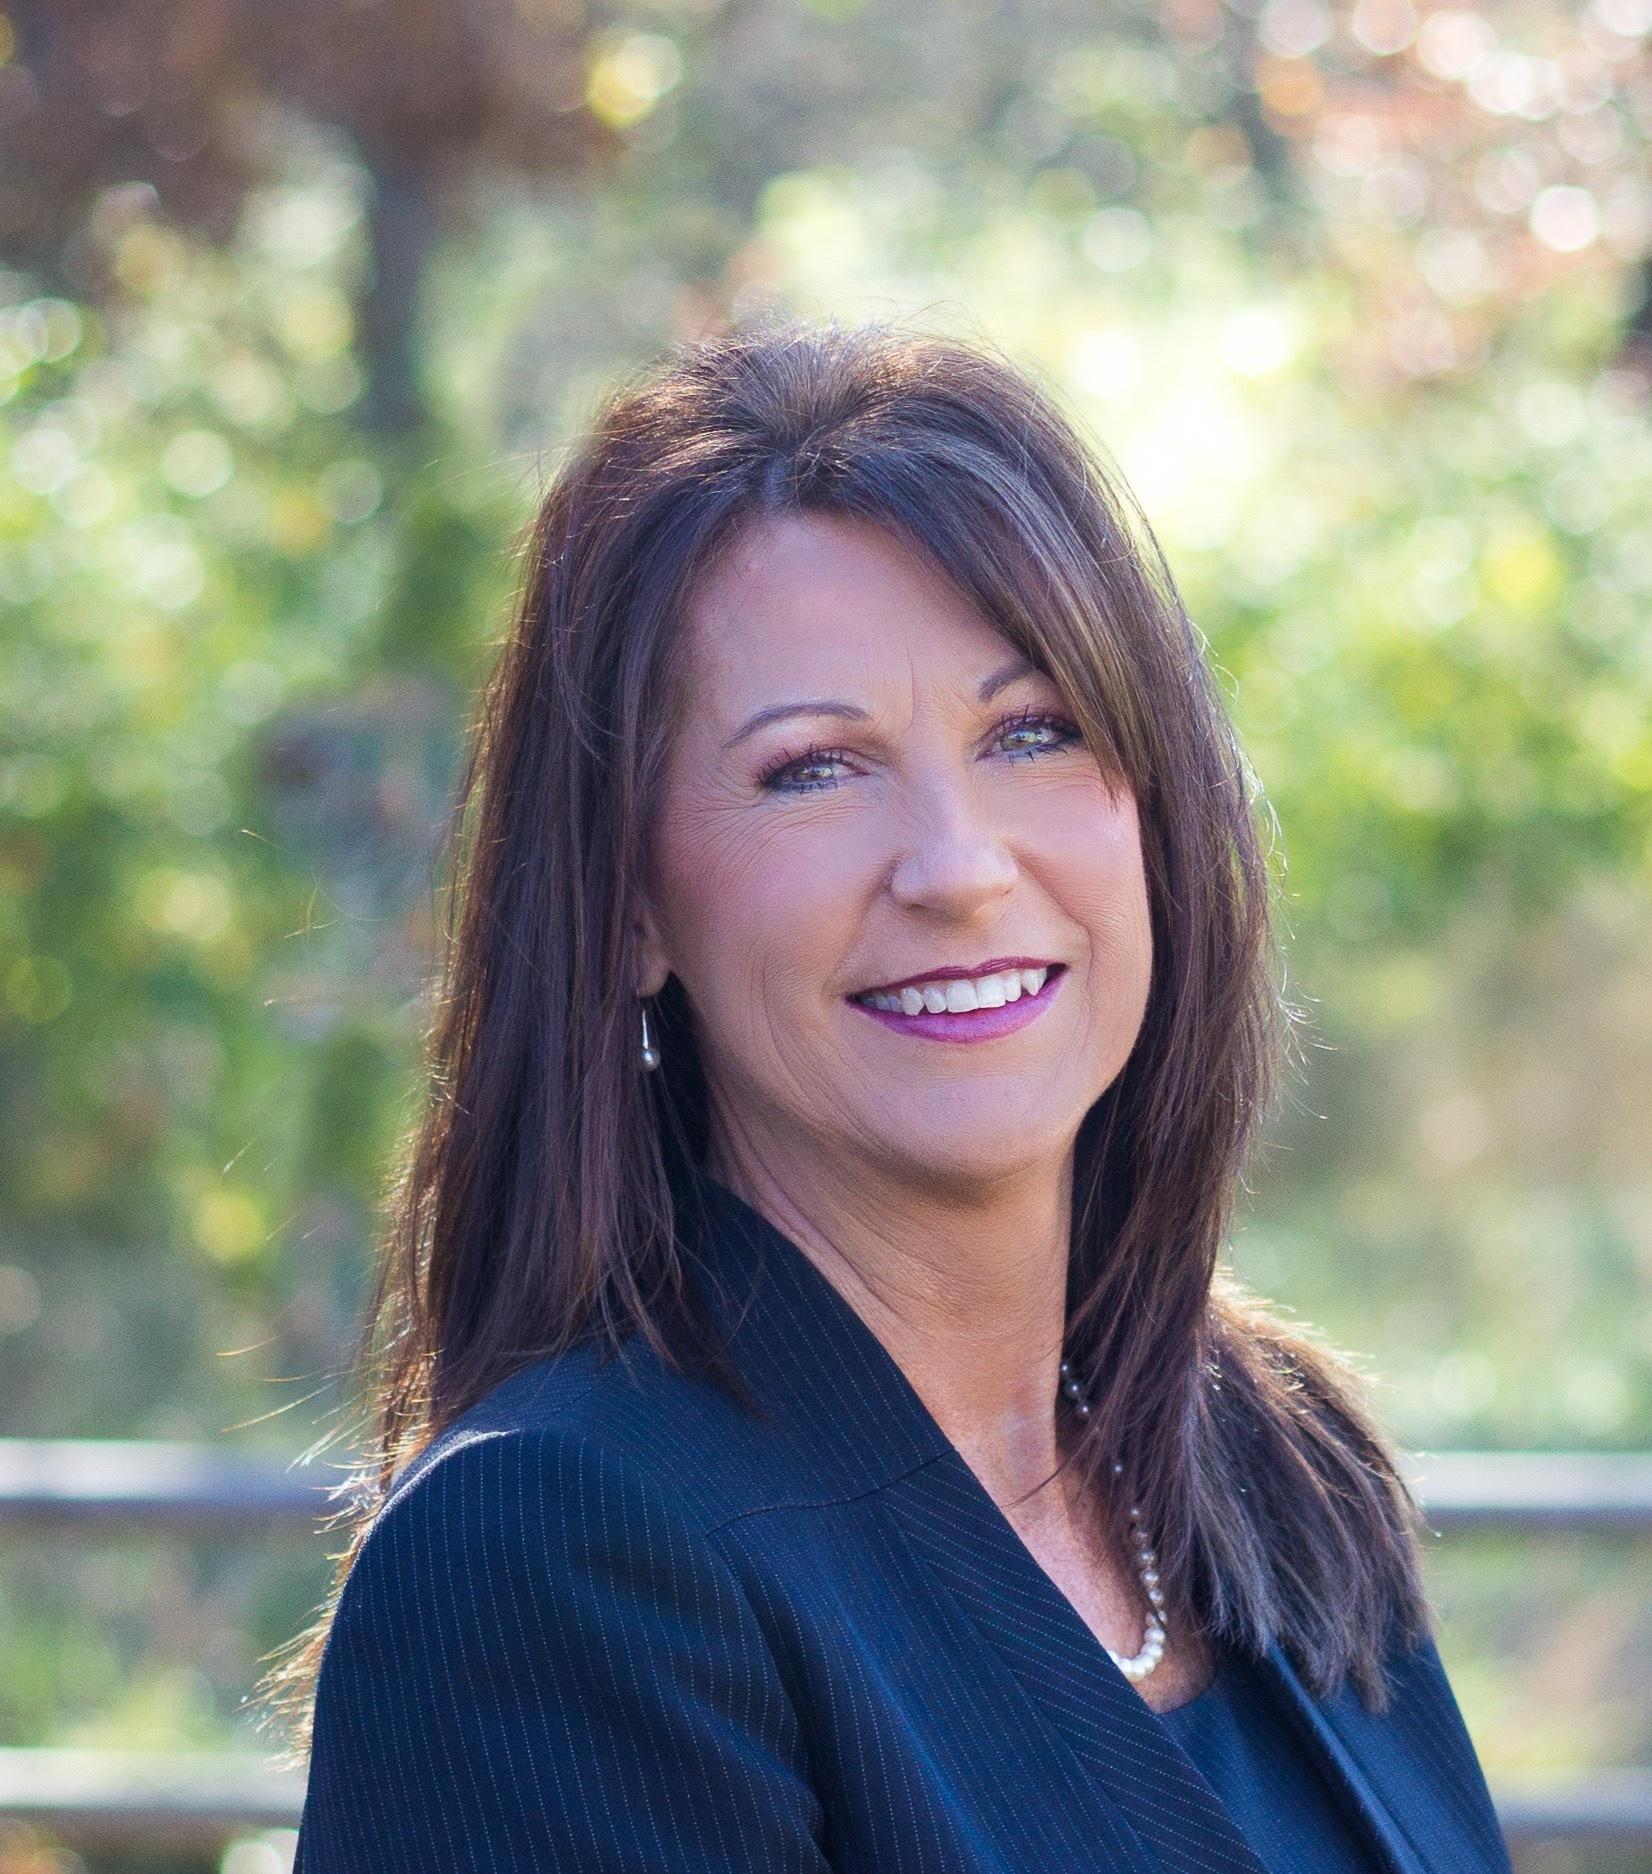 Dena Soden, Corporate Director of Strategic Accounts at JQH